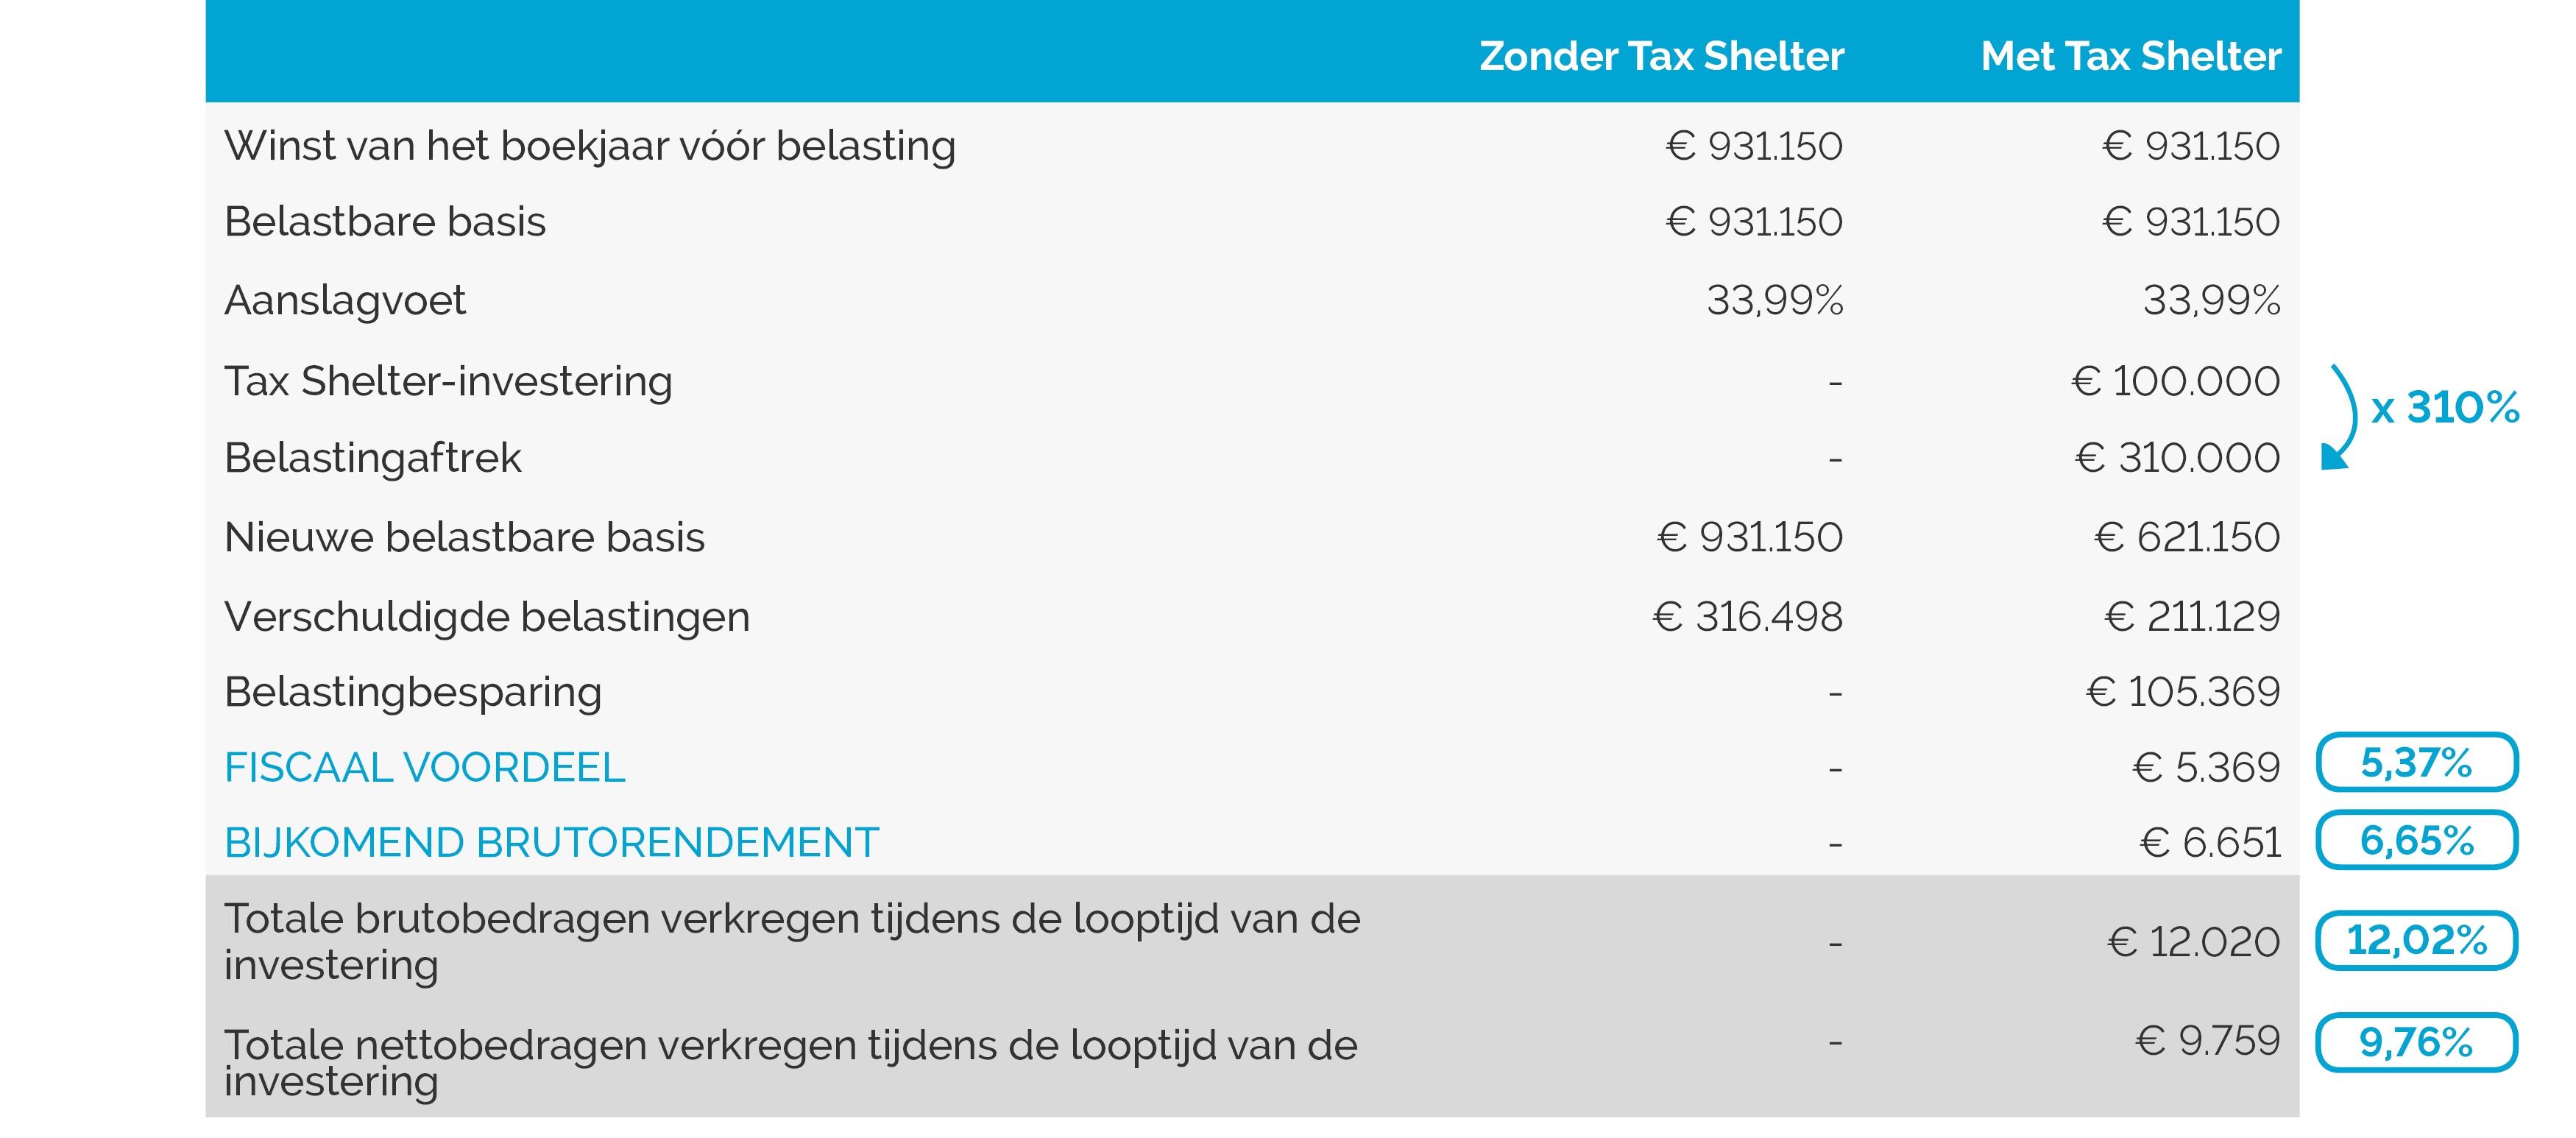 2017 tableau offre uFund NL-2.jpg